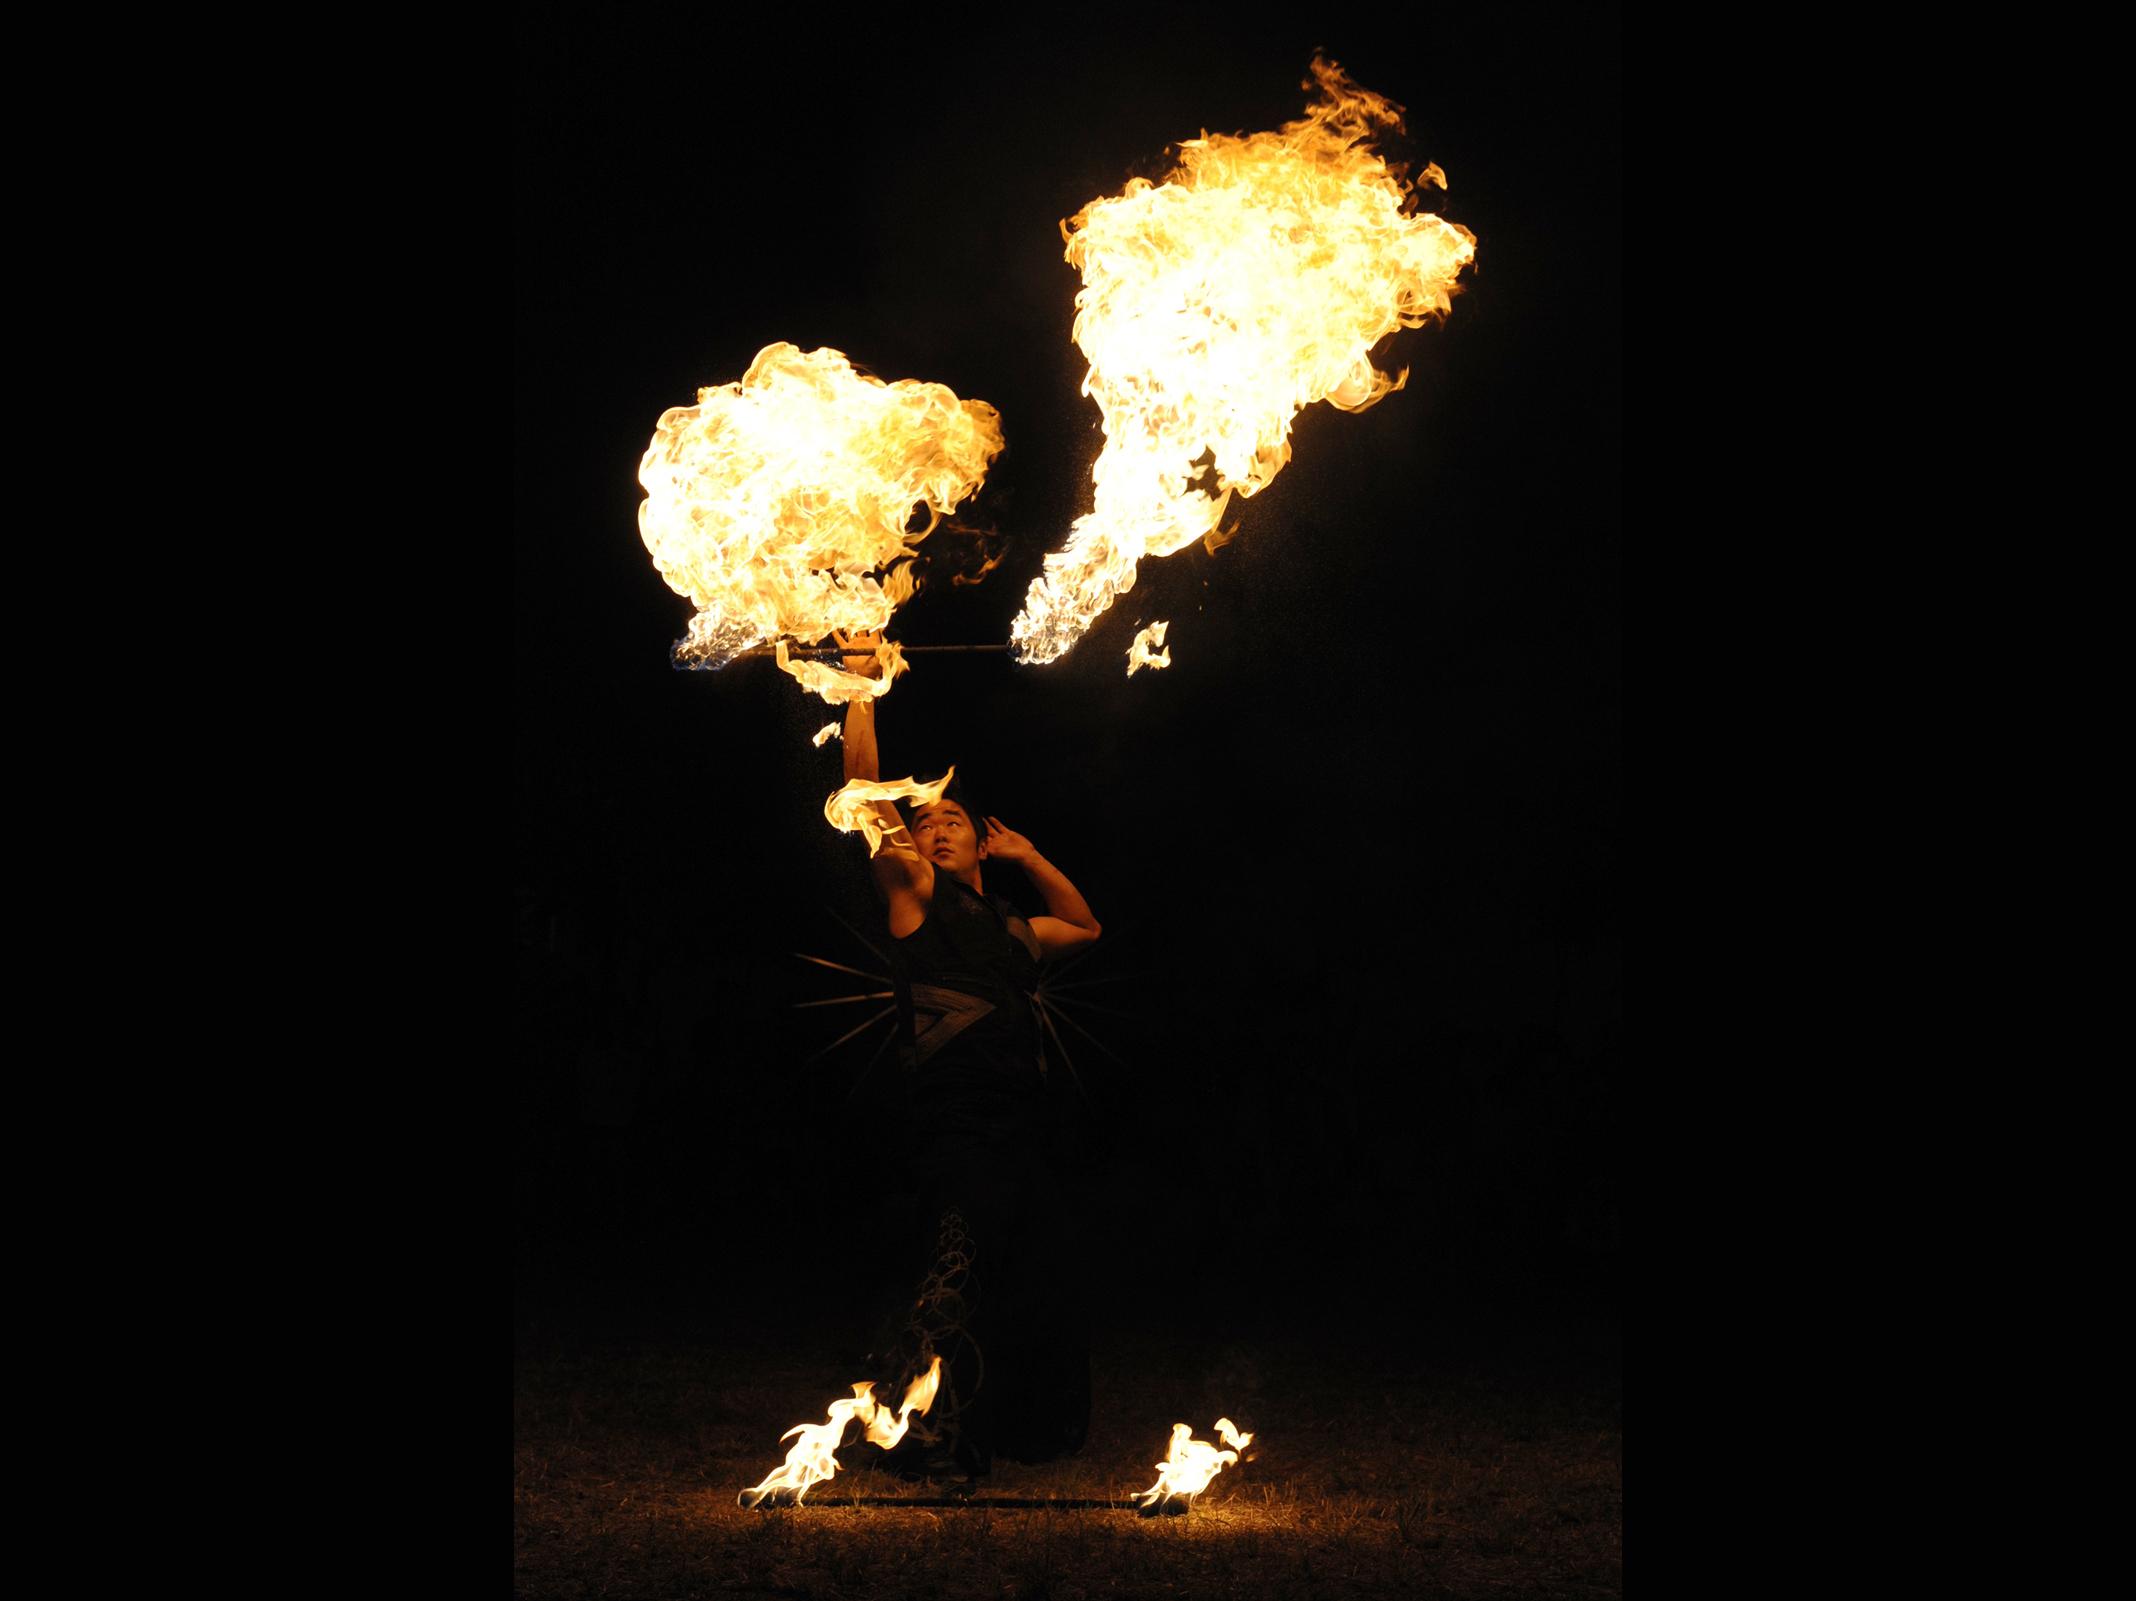 Fire Arts_Flaming Fire team_leeroy (5)